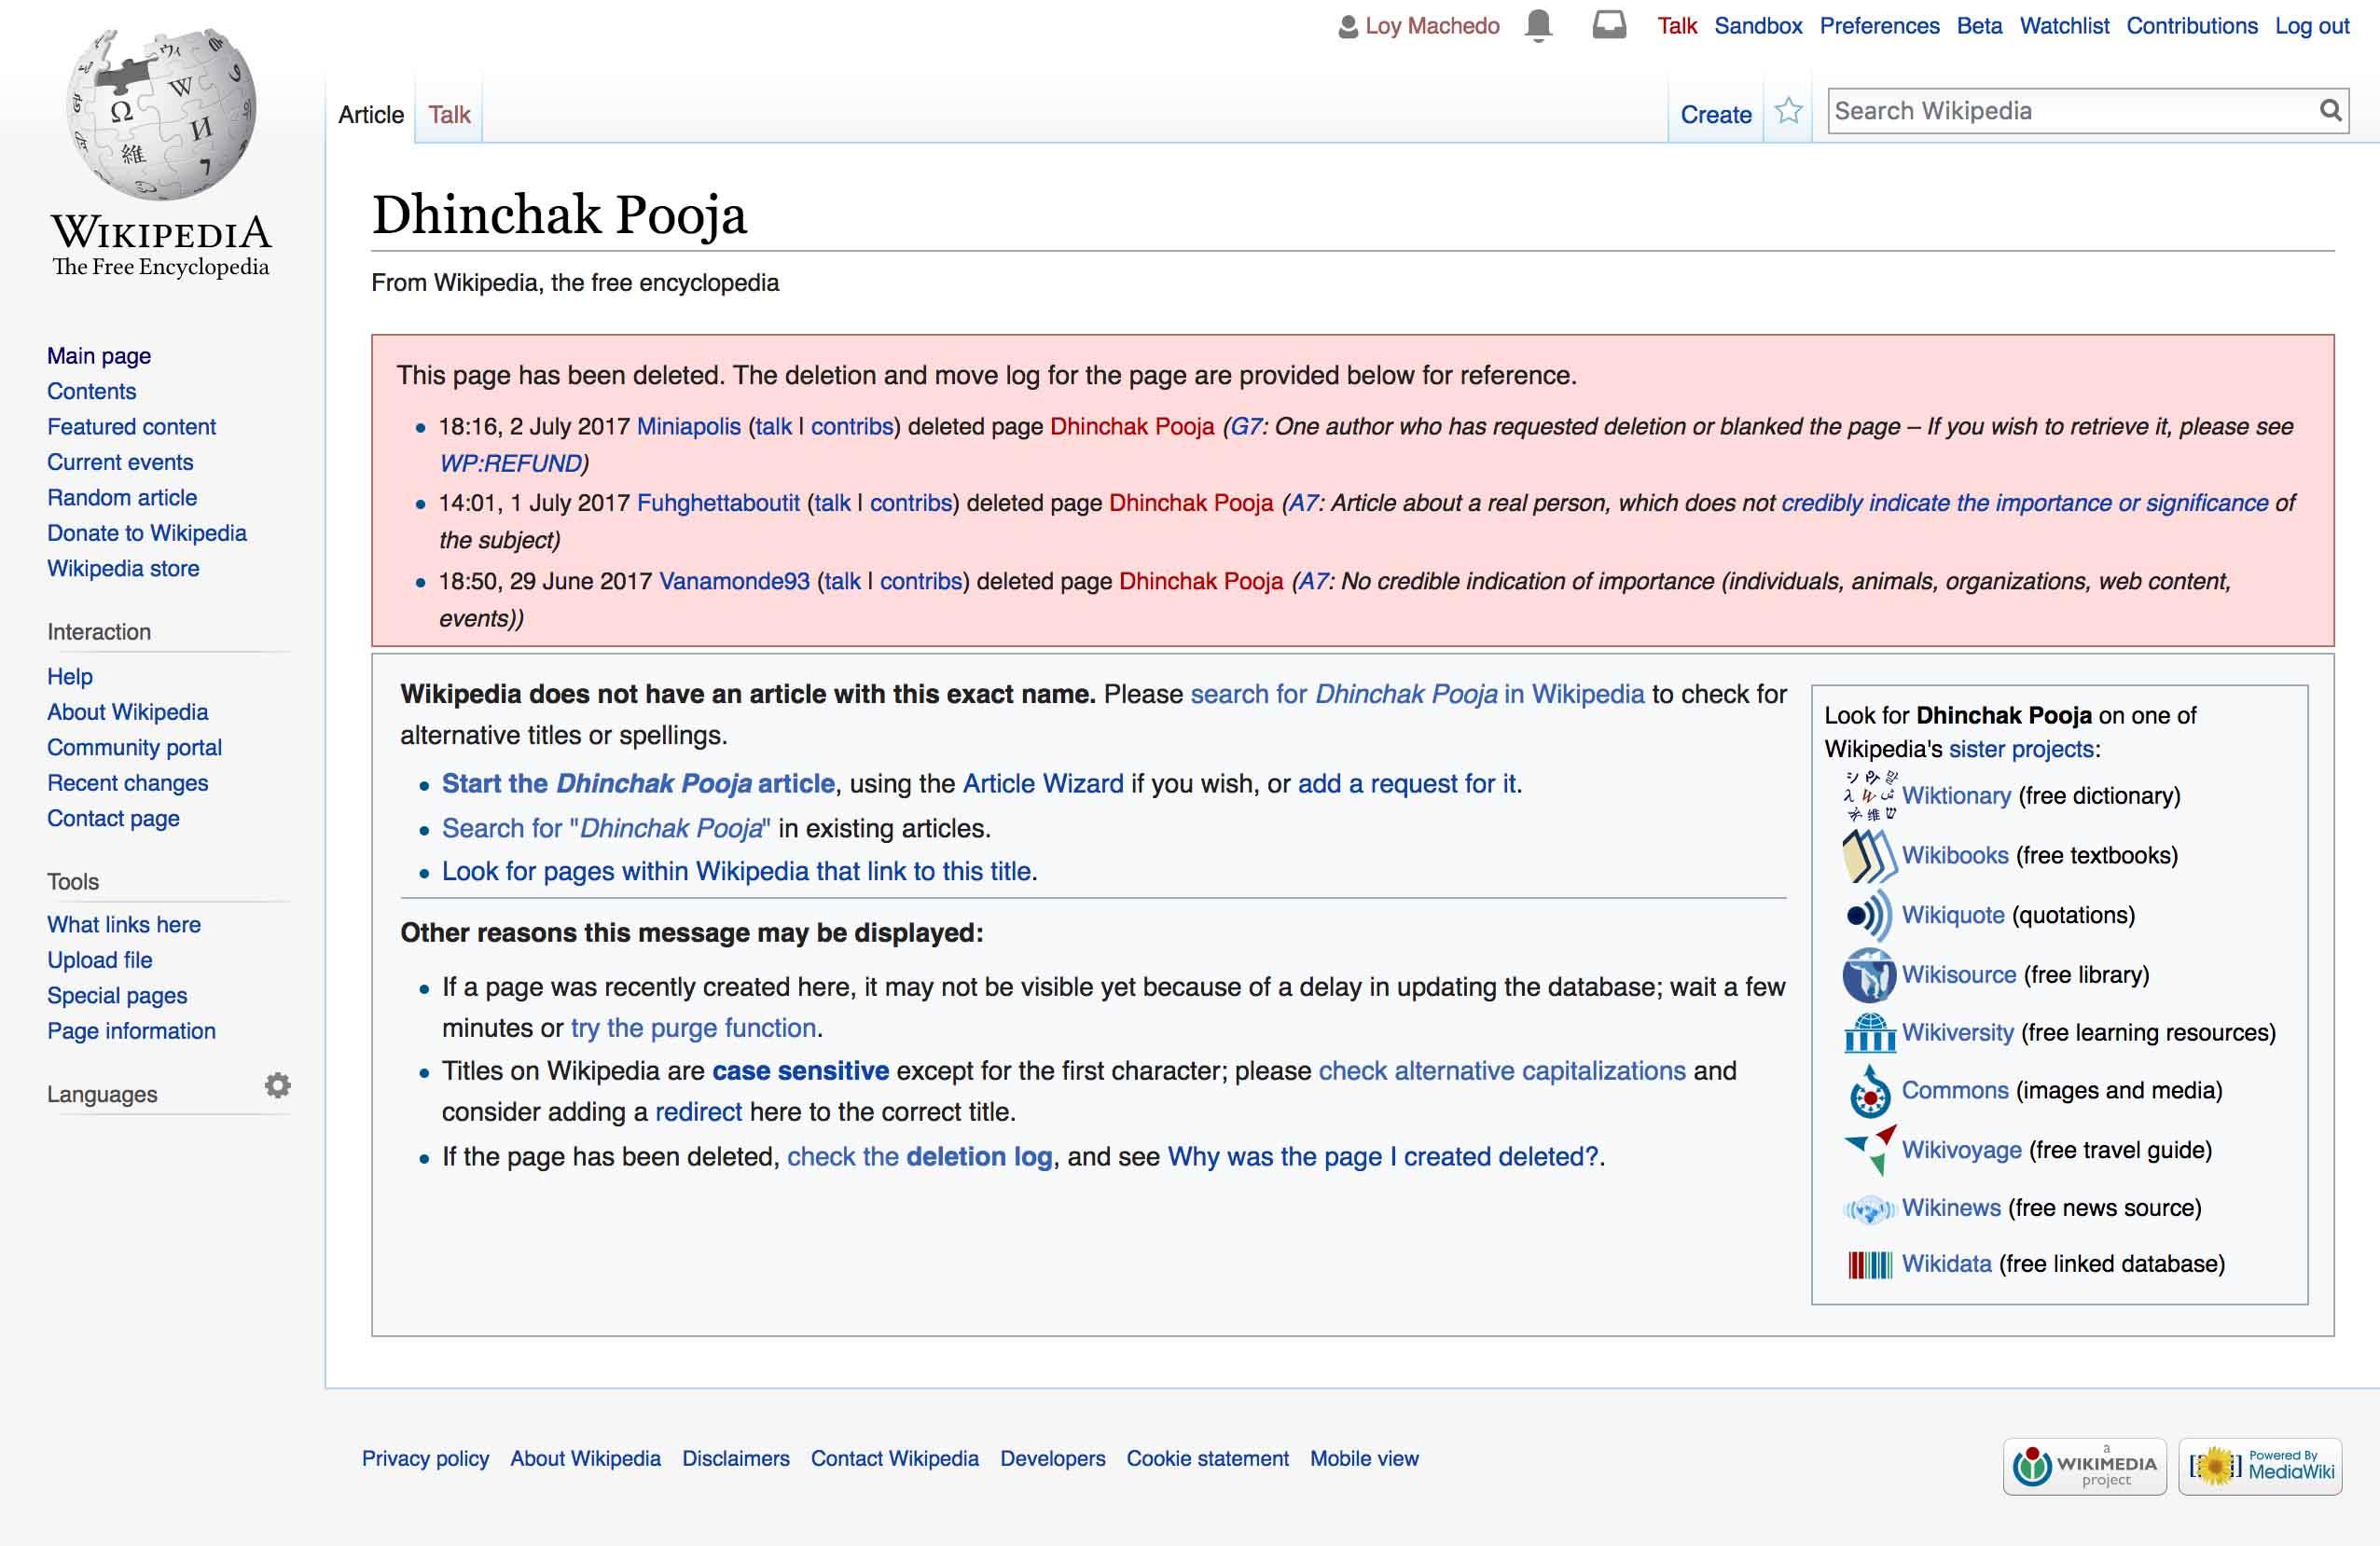 Dhinchak Pooja Wikipedia